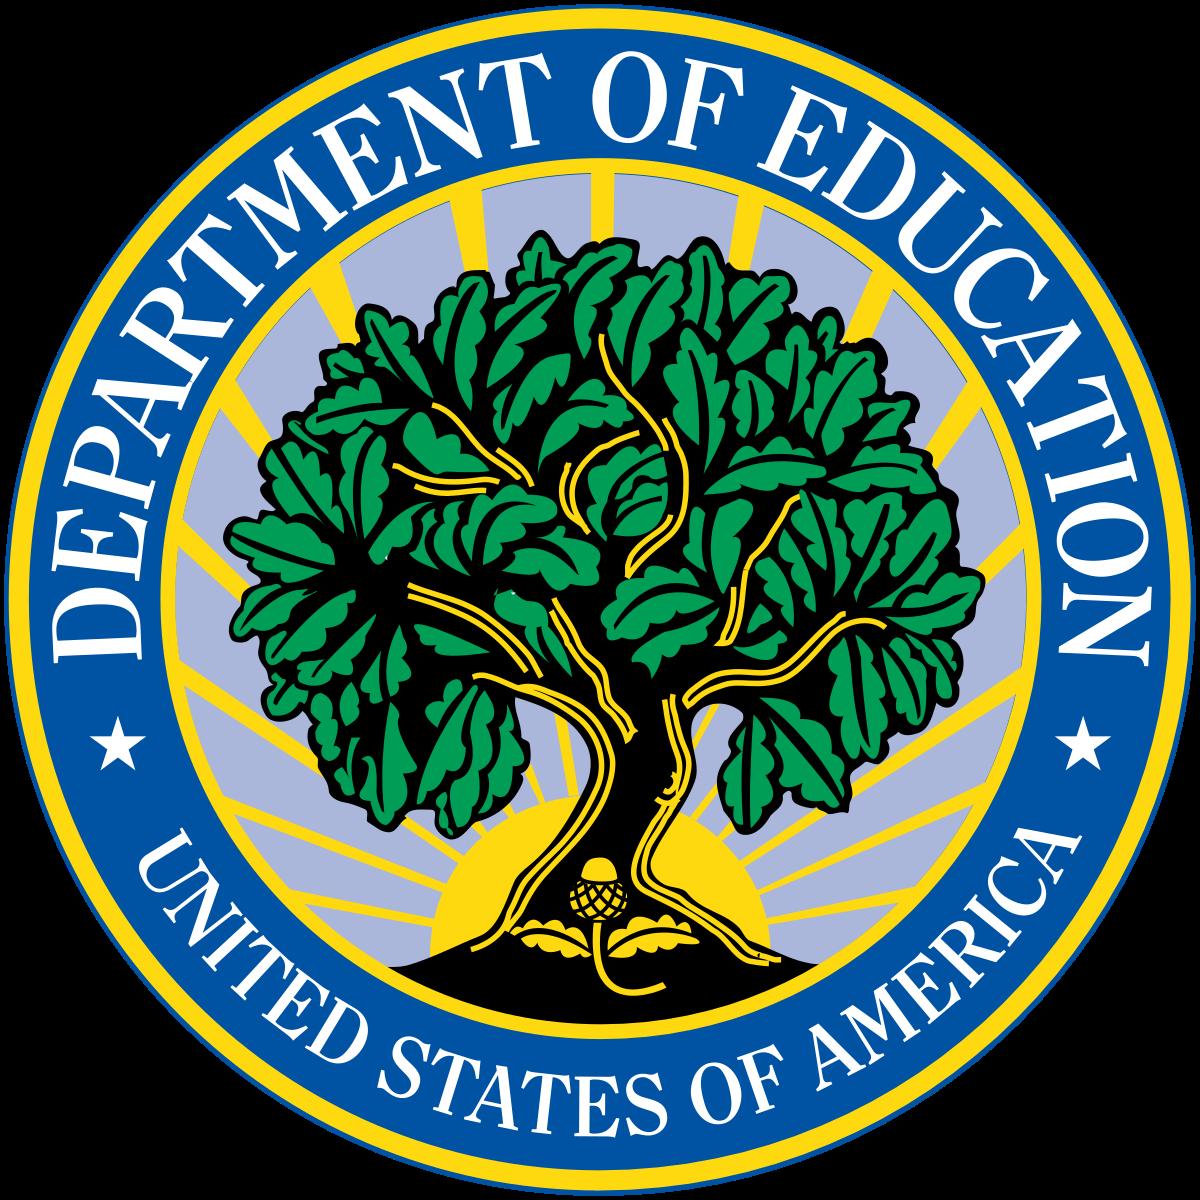 US Department of Education logo.